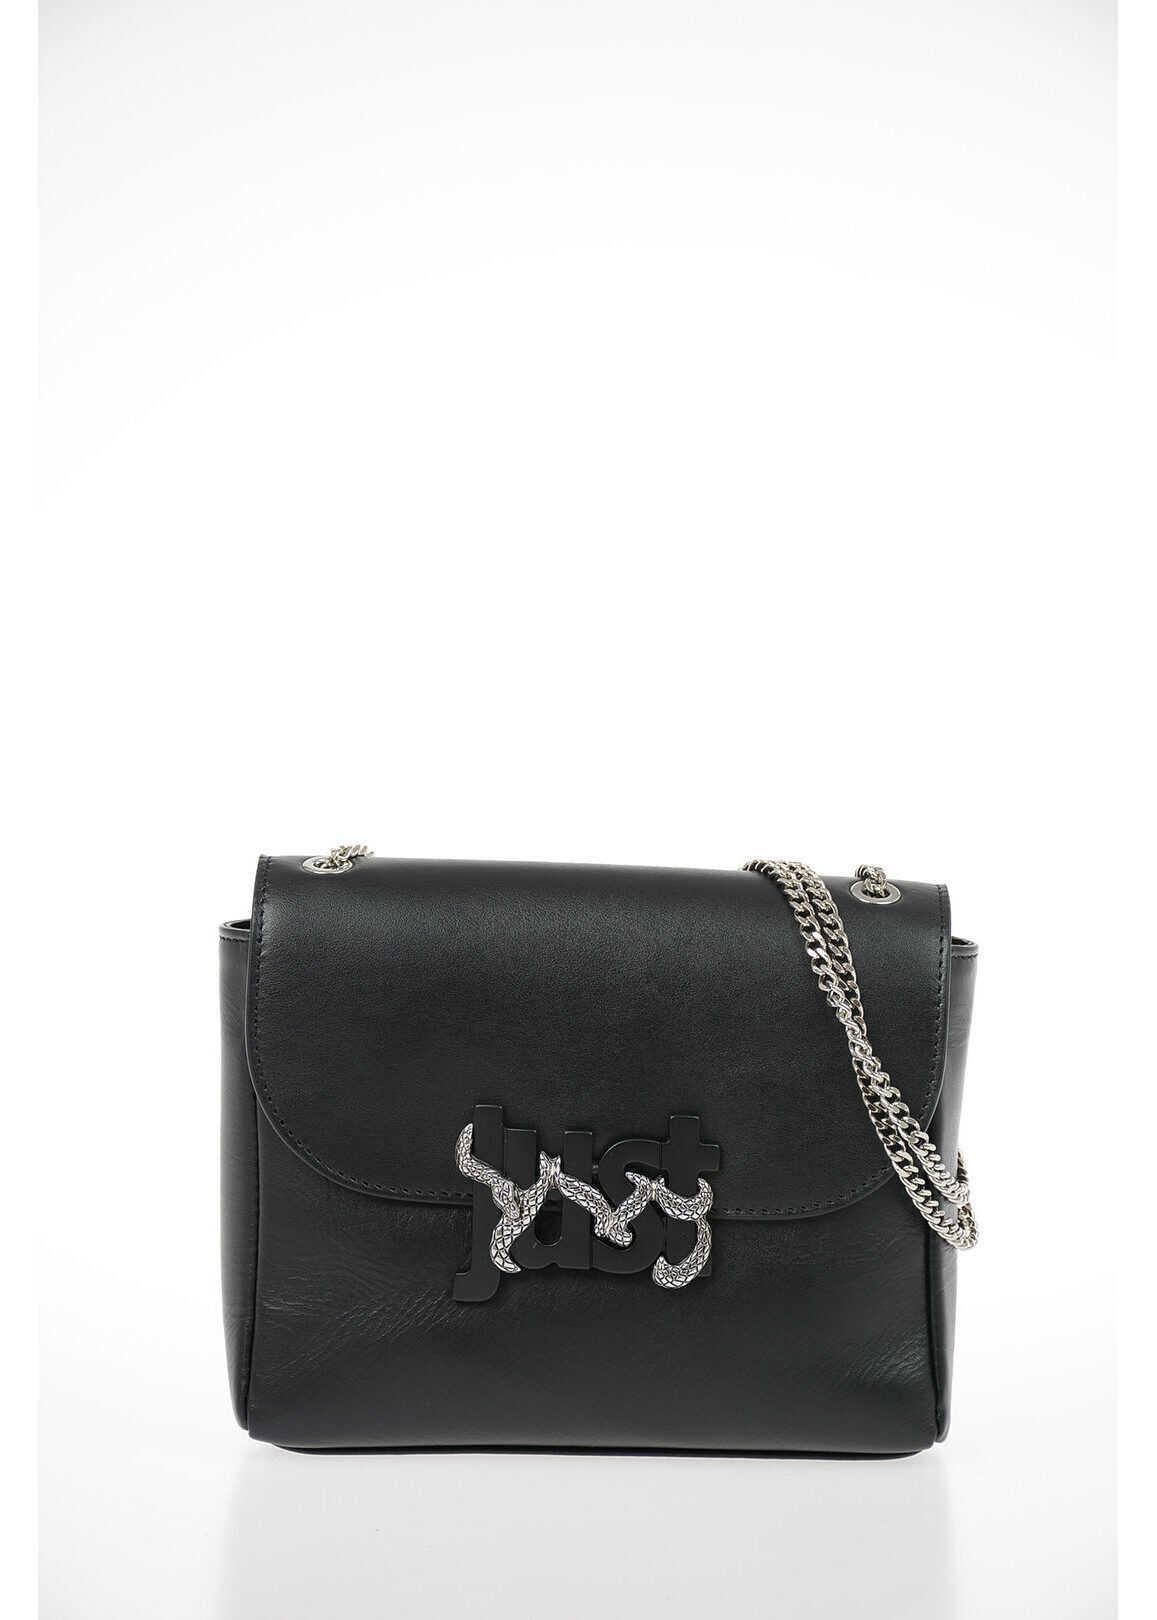 Just Cavalli Leather Shoulder Pochette BLACK imagine b-mall.ro